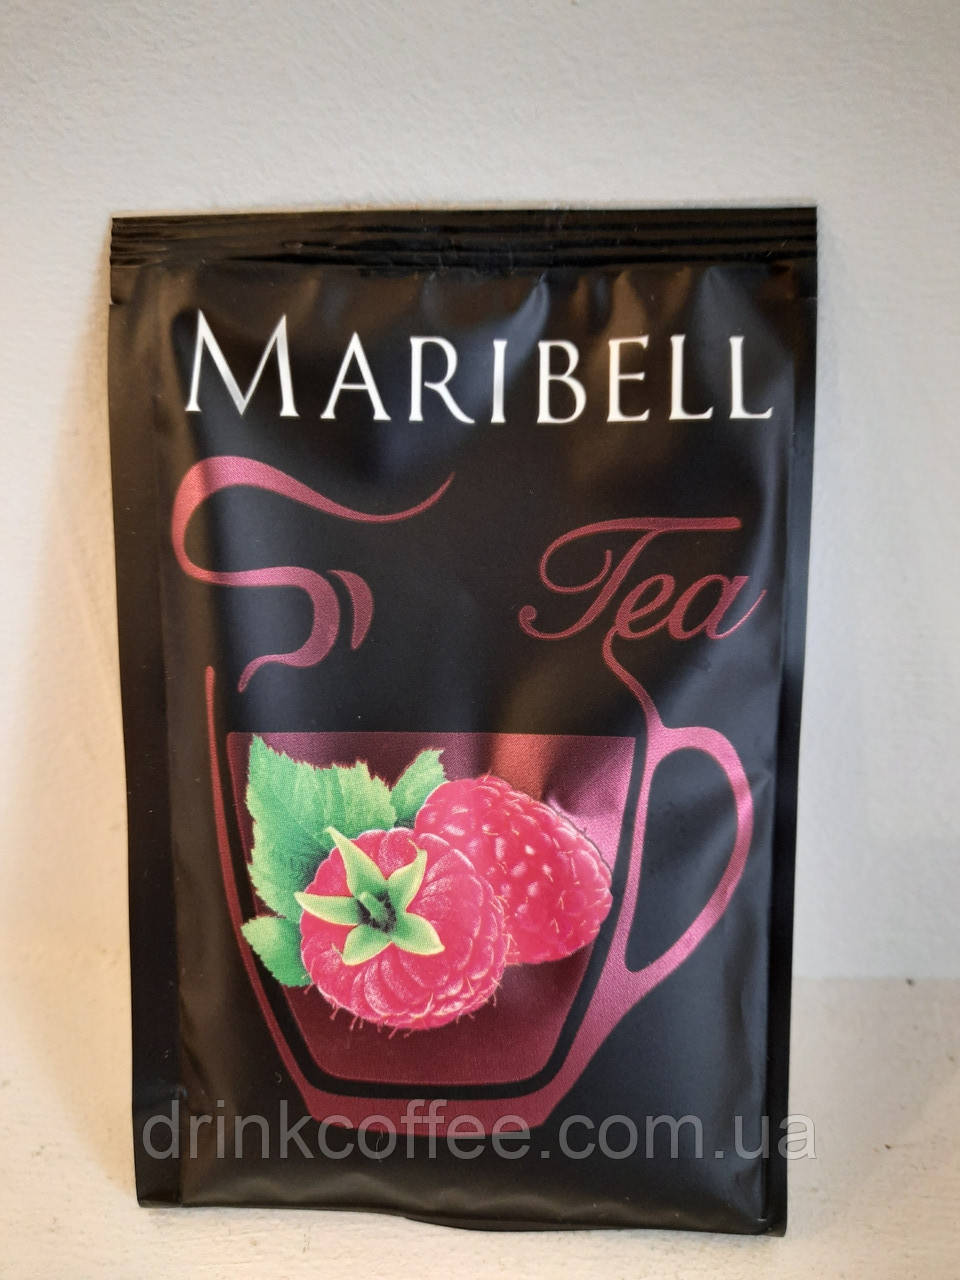 Чай-концентрат малиновый ТМ Maribell